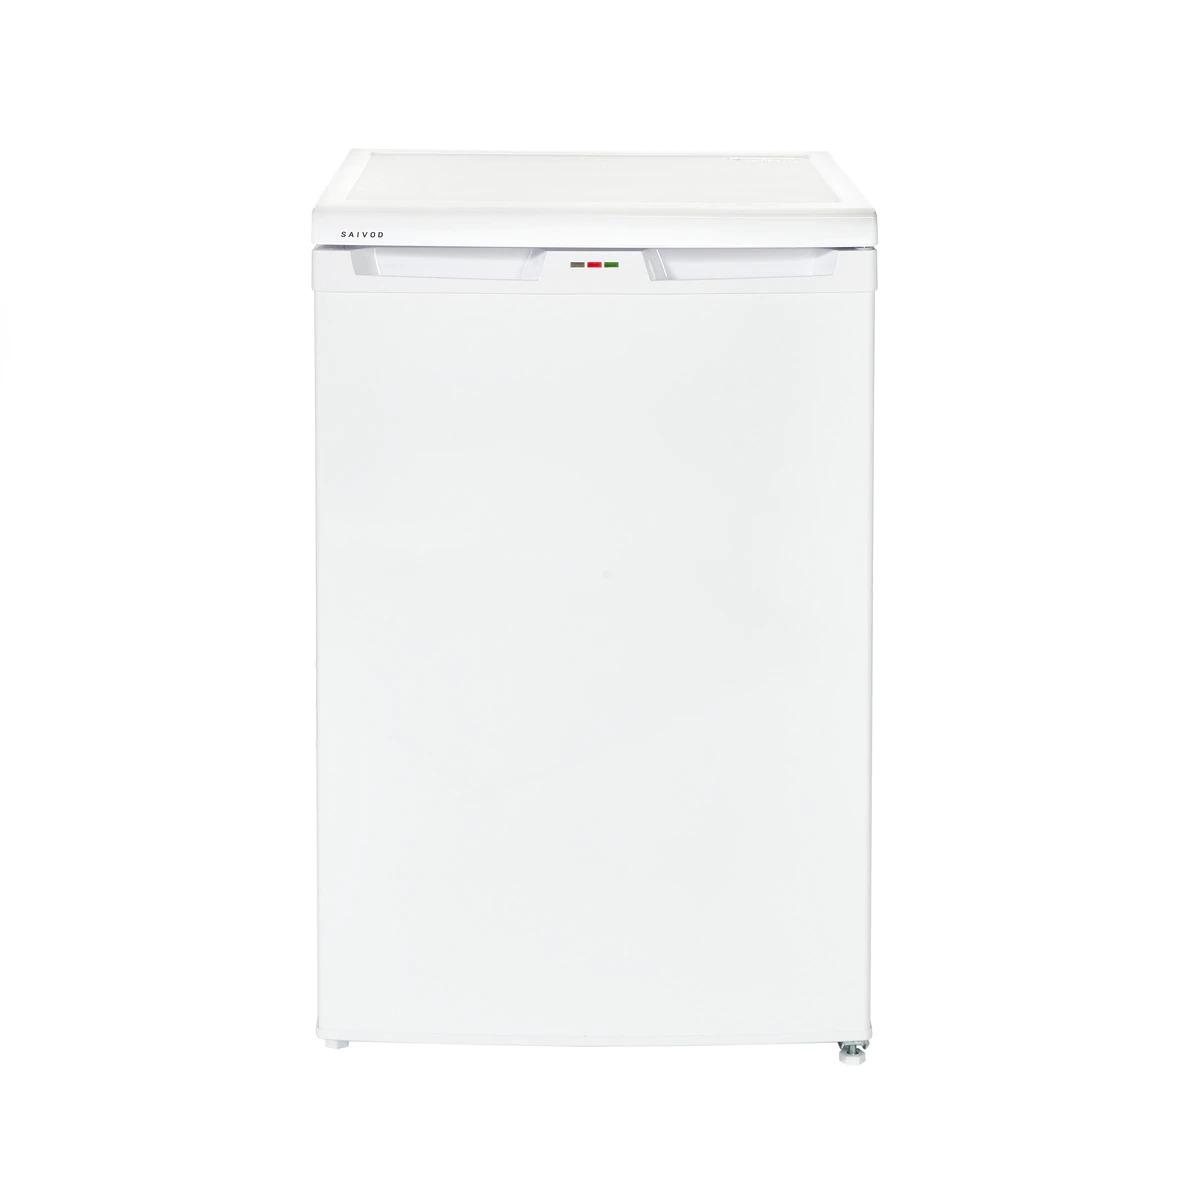 Saivod TTC84N Upright Freezer with Static Cold